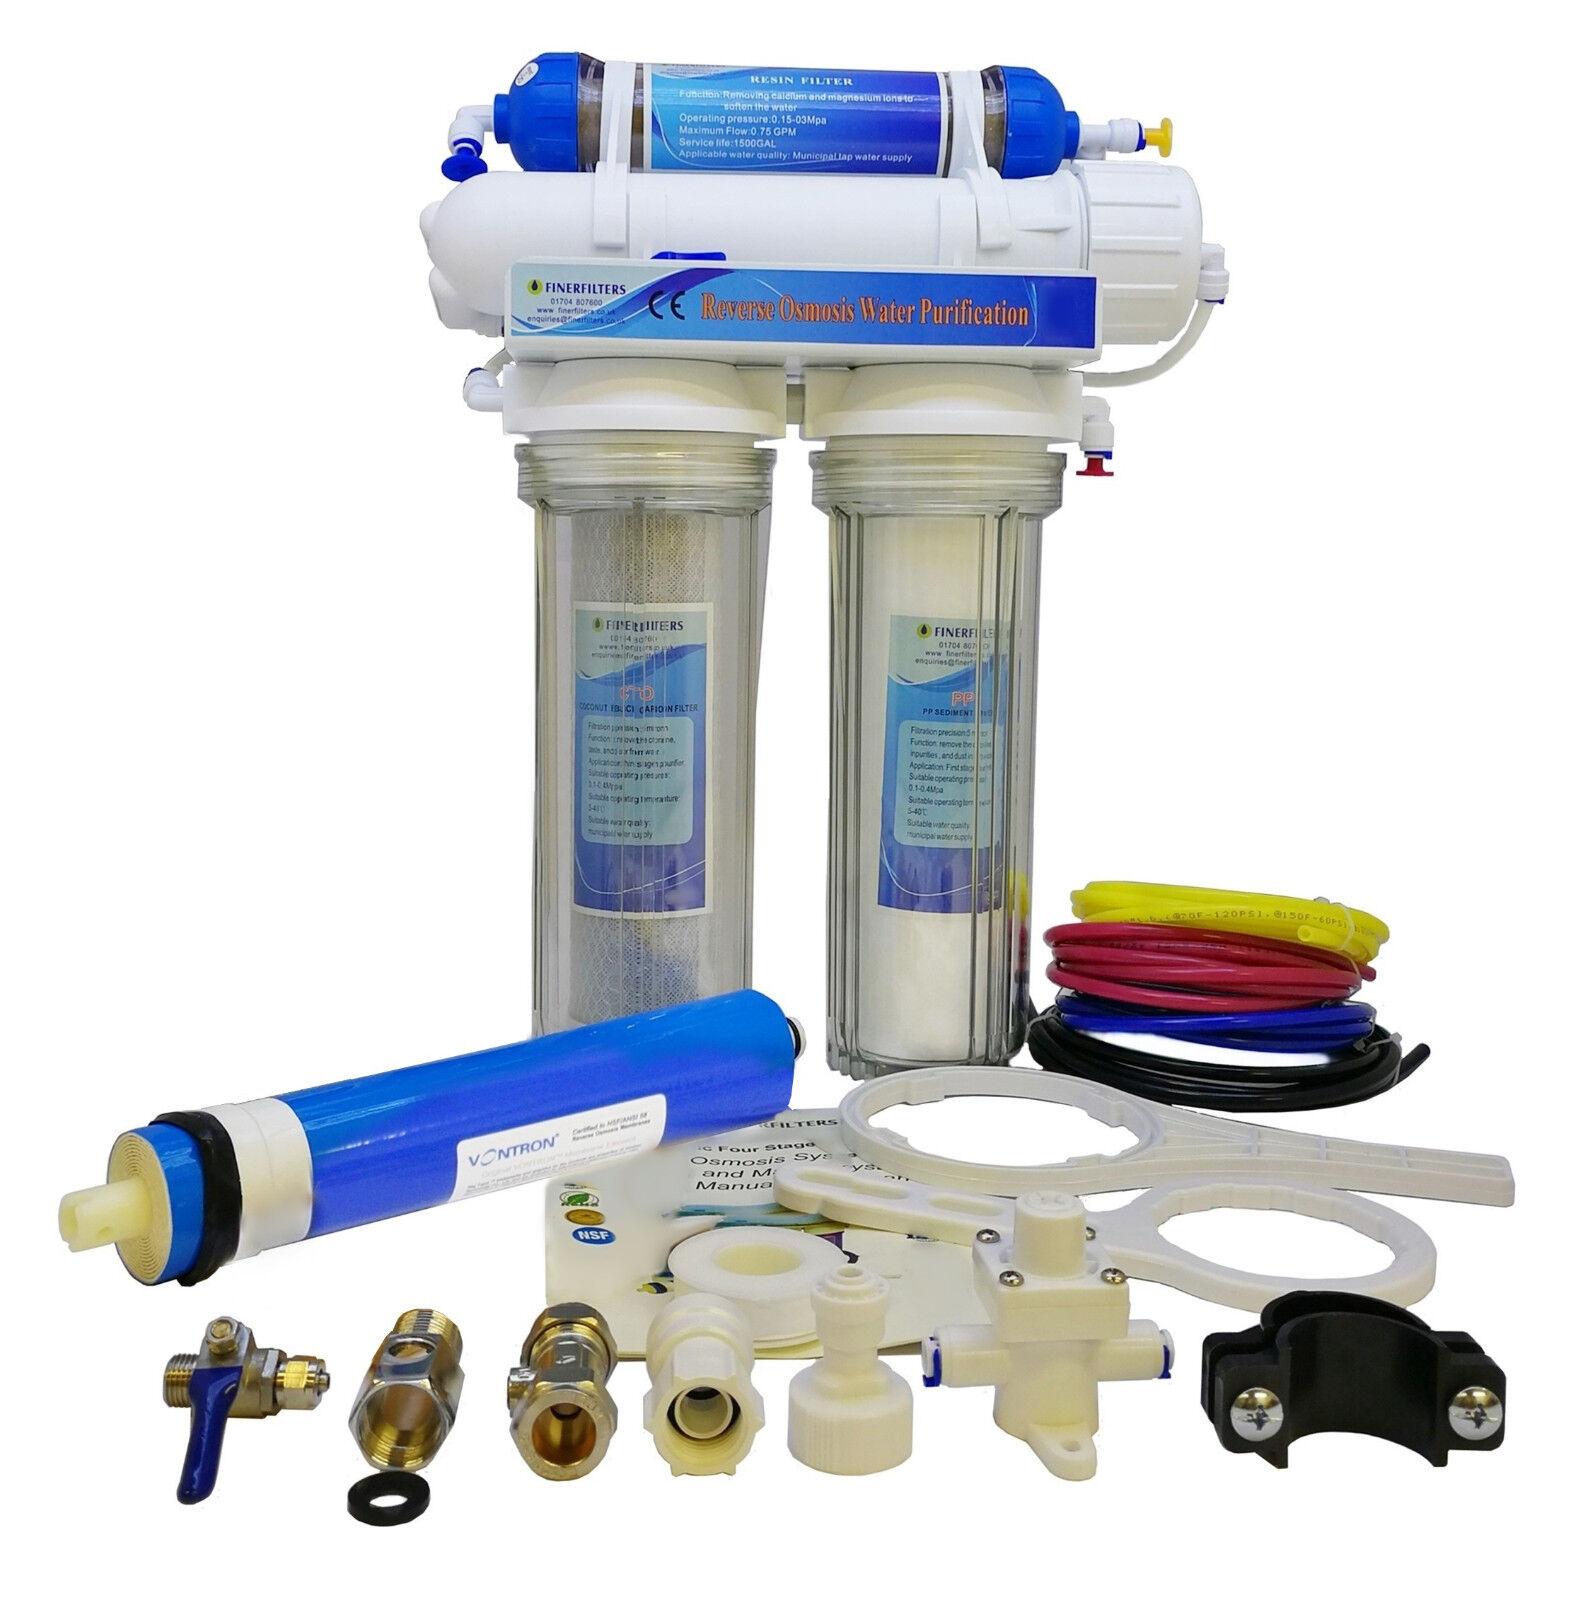 Ymwave Reutilizables Universal Multicolor Velcro Cable Fijaci/ón Gesti/ón Organizador Cuerda Home Office Electronics Wire 50 Pcs